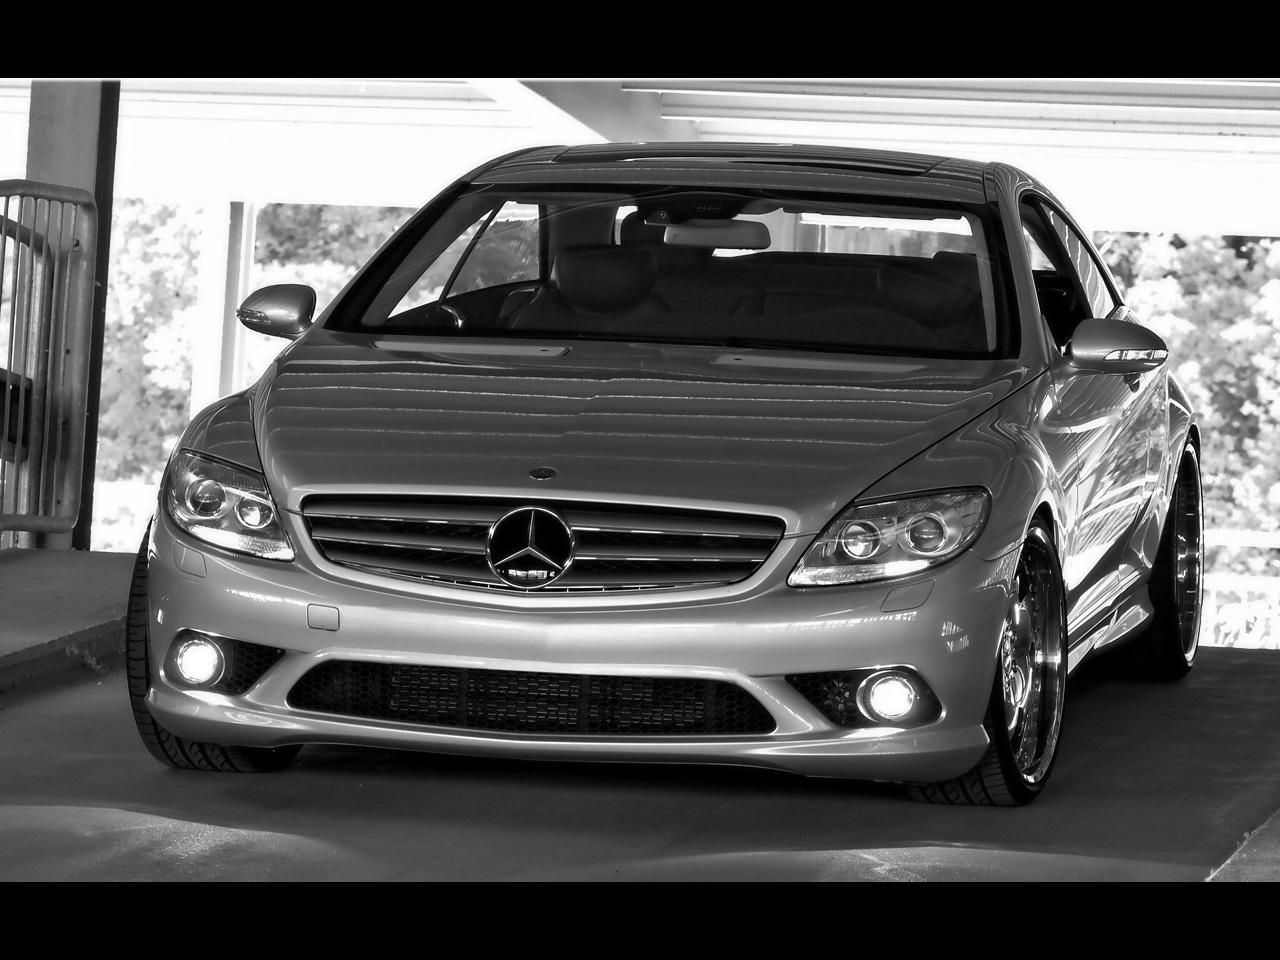 http://1.bp.blogspot.com/-MklAhMfVgGc/ThNkYdF3WqI/AAAAAAAAG0Y/uZxZ54UYnfI/s1600/Mercedes-Benz+CL+45+Wallpapers+2.jpg